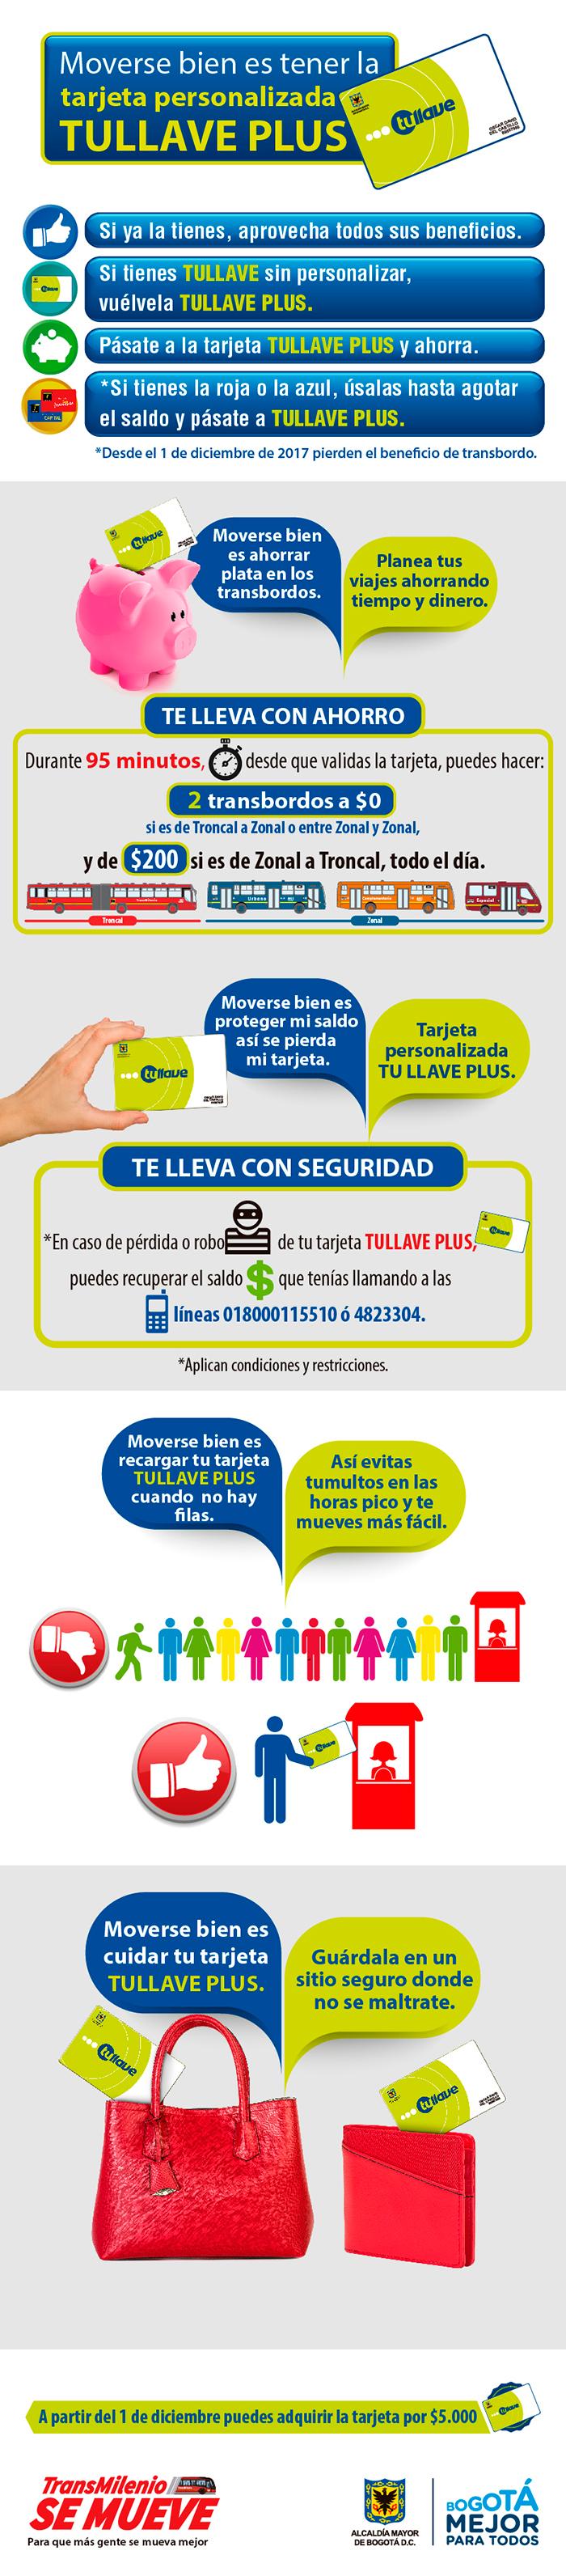 Infografía de como obtener la tarjeta Tullaveplus